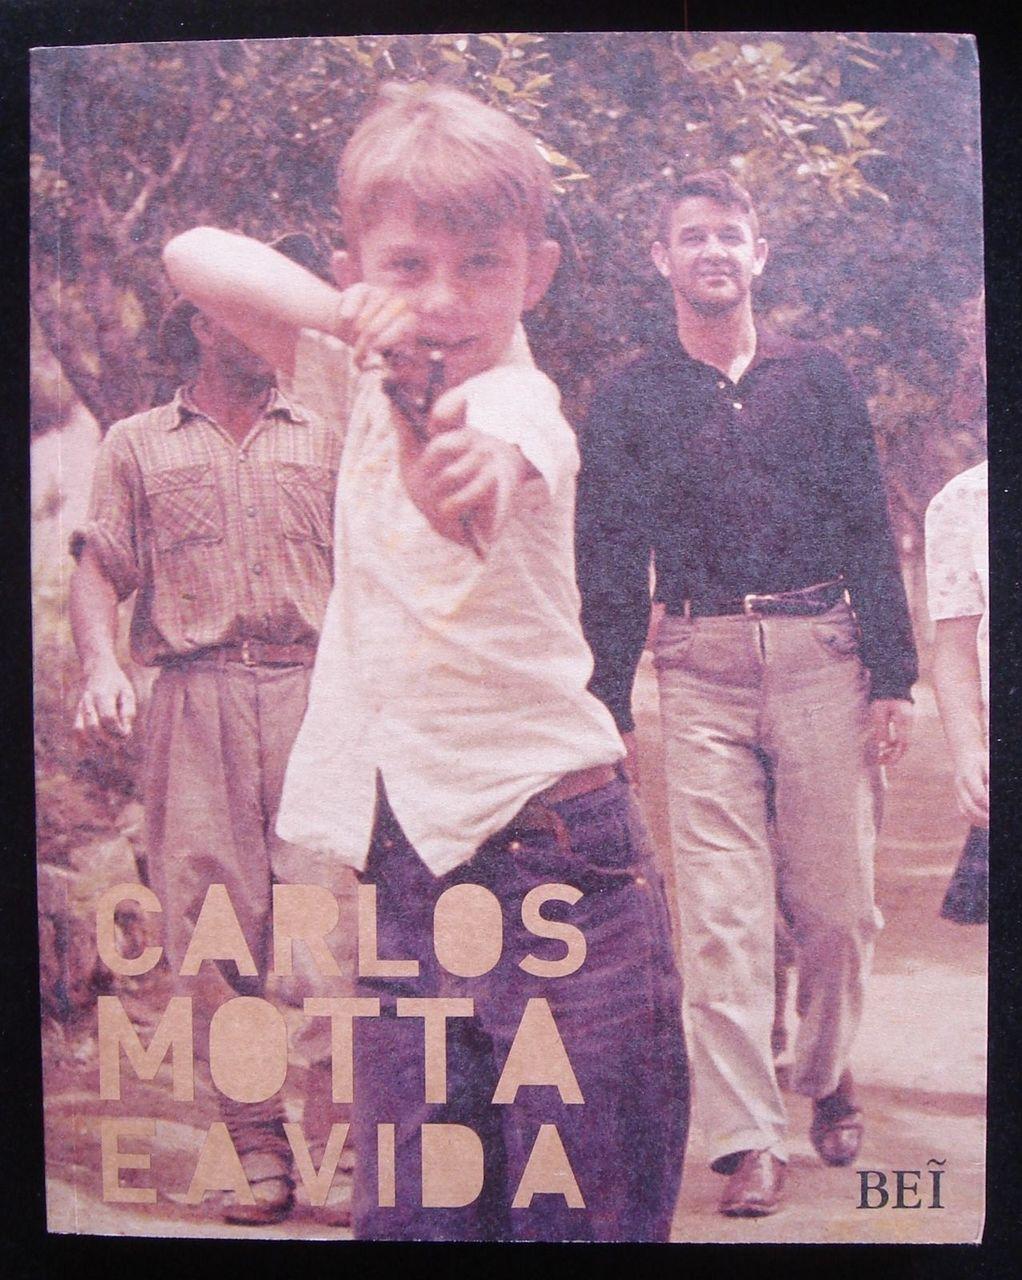 CARLOS MOTTA E A VIDA, by Carlos Lichtenfels Motta - 2010